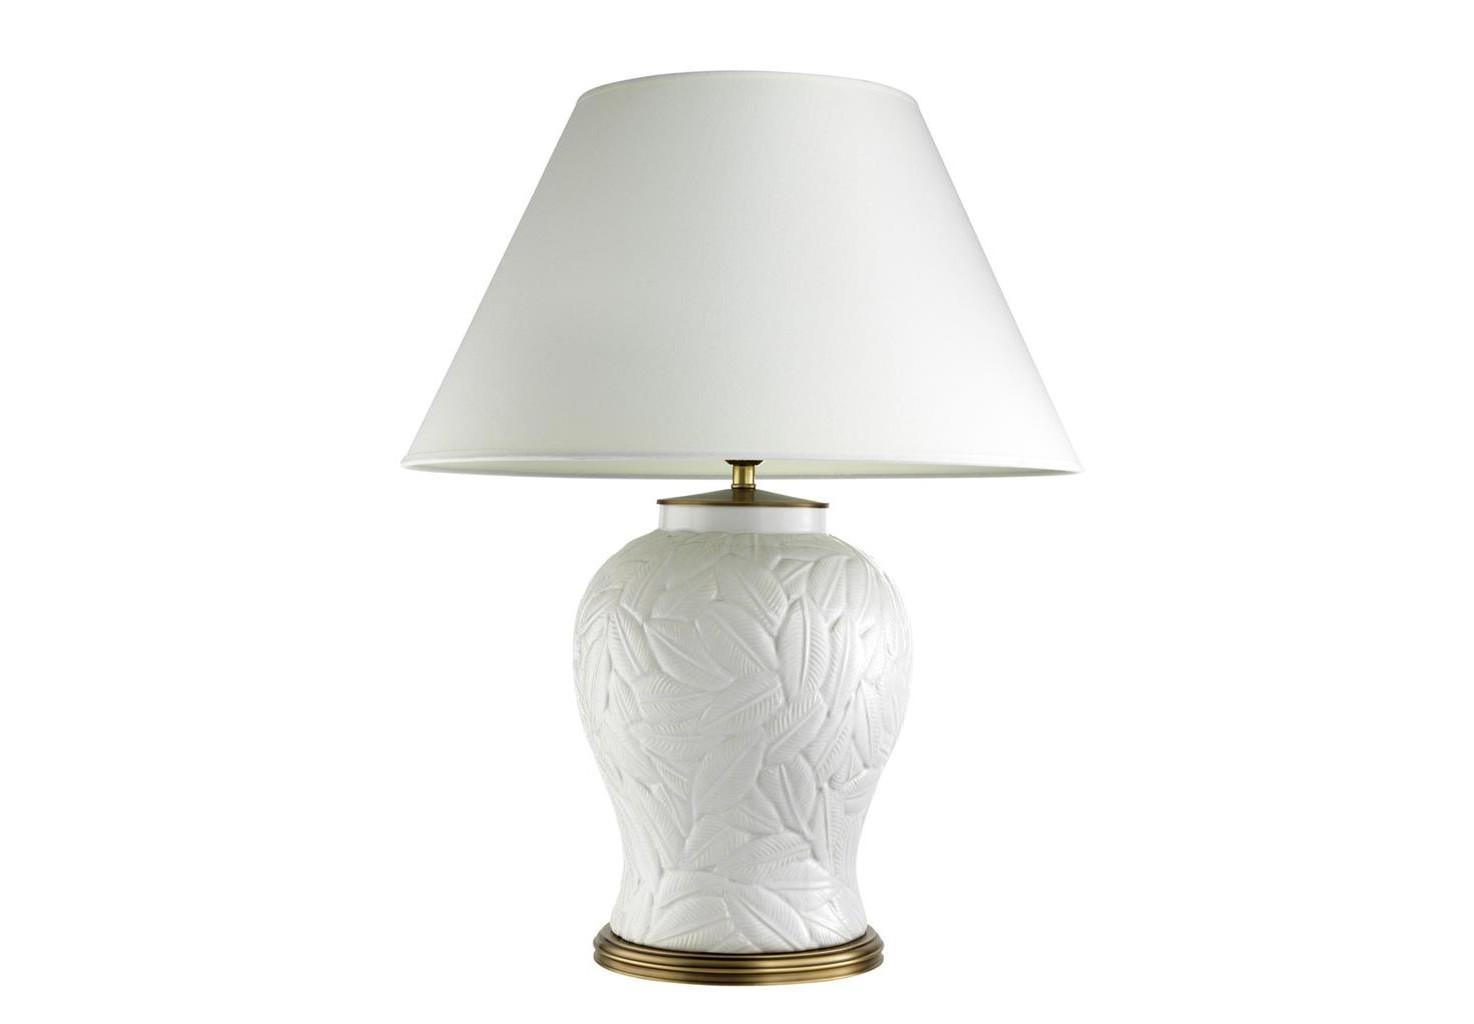 Настольная лампаДекоративные лампы<br>Настольная лампа Table Lamp Cyprus с вазой из керамики белого цвета. Текстильный белый абажур скрывает лампу.&amp;lt;div&amp;gt;&amp;lt;br&amp;gt;&amp;lt;/div&amp;gt;&amp;lt;div&amp;gt;&amp;lt;div&amp;gt;Тип цоколя: E27&amp;lt;/div&amp;gt;&amp;lt;div&amp;gt;Мощность: 40W&amp;lt;/div&amp;gt;&amp;lt;div&amp;gt;Кол-во ламп: 1 (нет в комплекте)&amp;lt;/div&amp;gt;&amp;lt;/div&amp;gt;<br><br>Material: Керамика<br>Height см: 85<br>Diameter см: 65